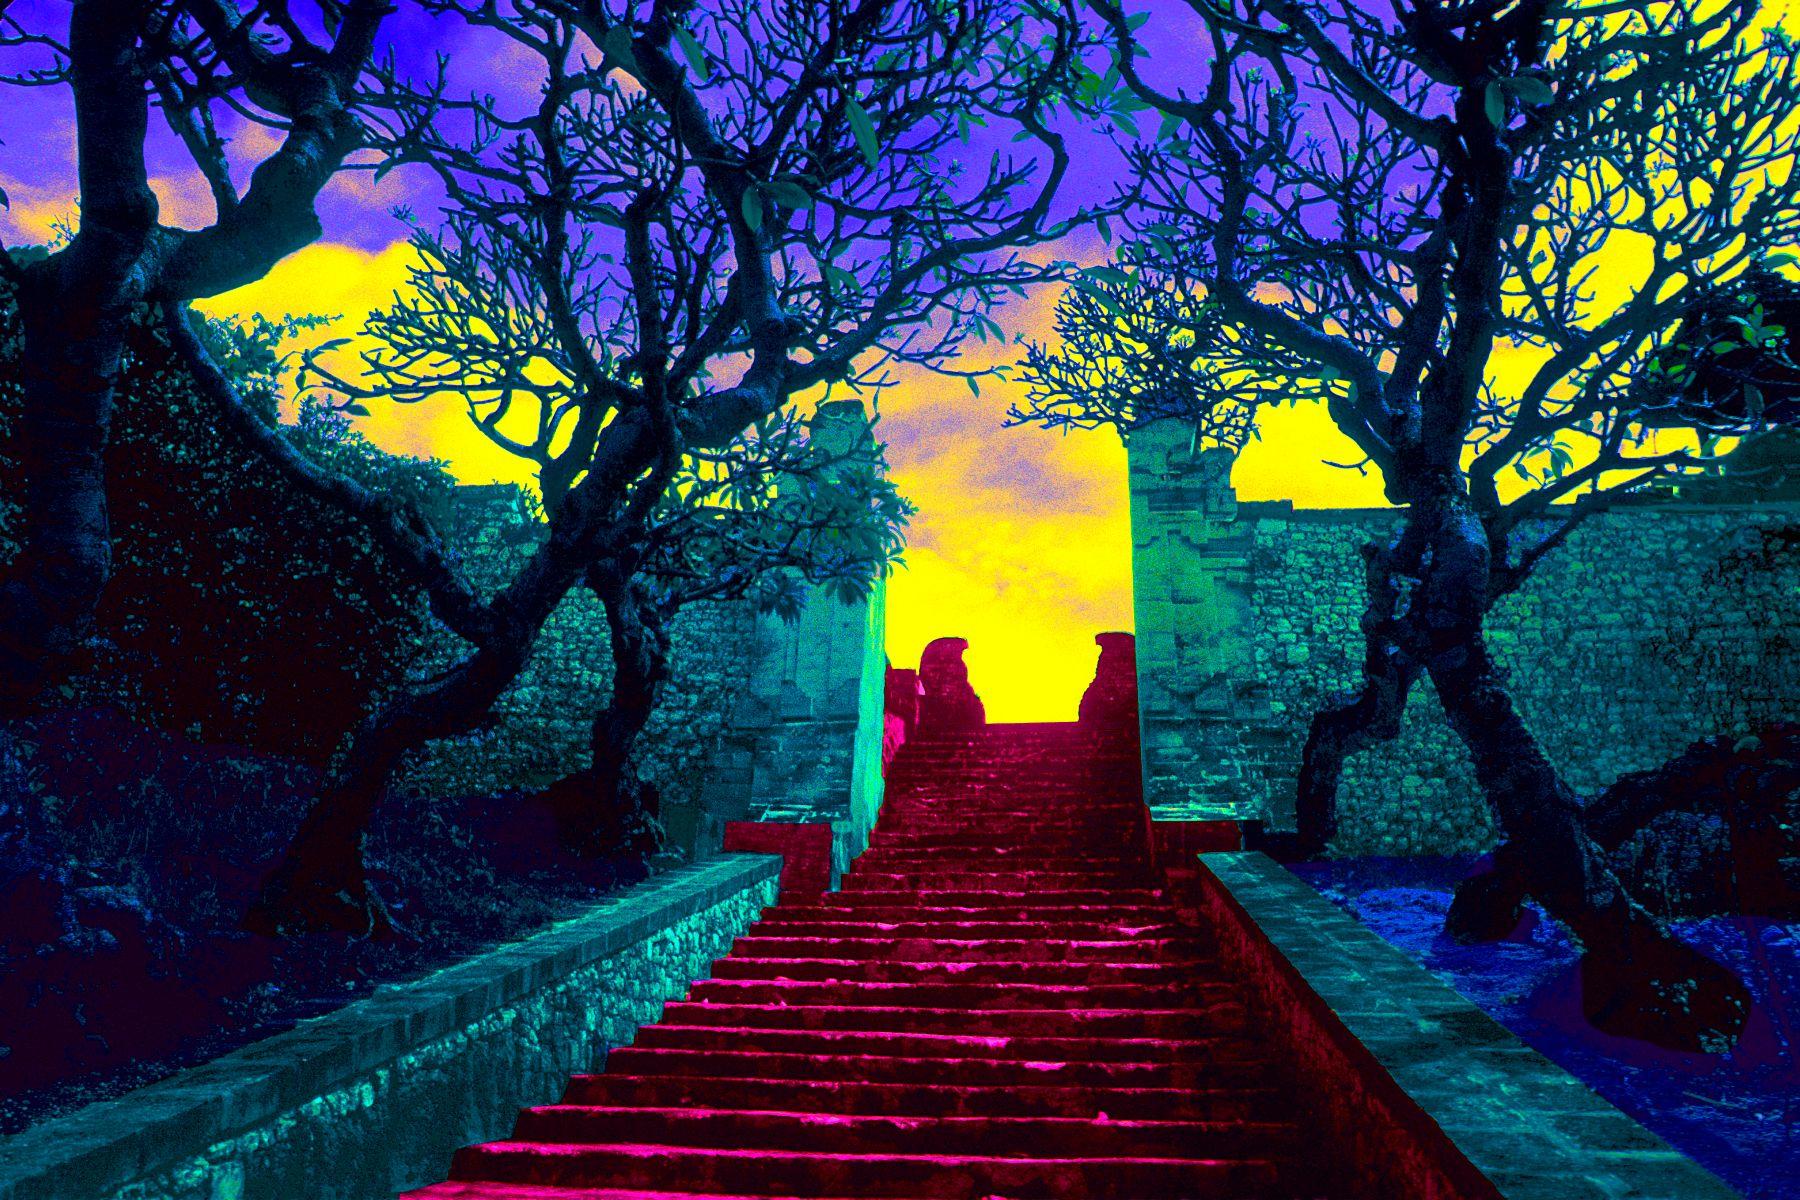 1_0_223_1gottlieb_bali_steps_ws.jpg